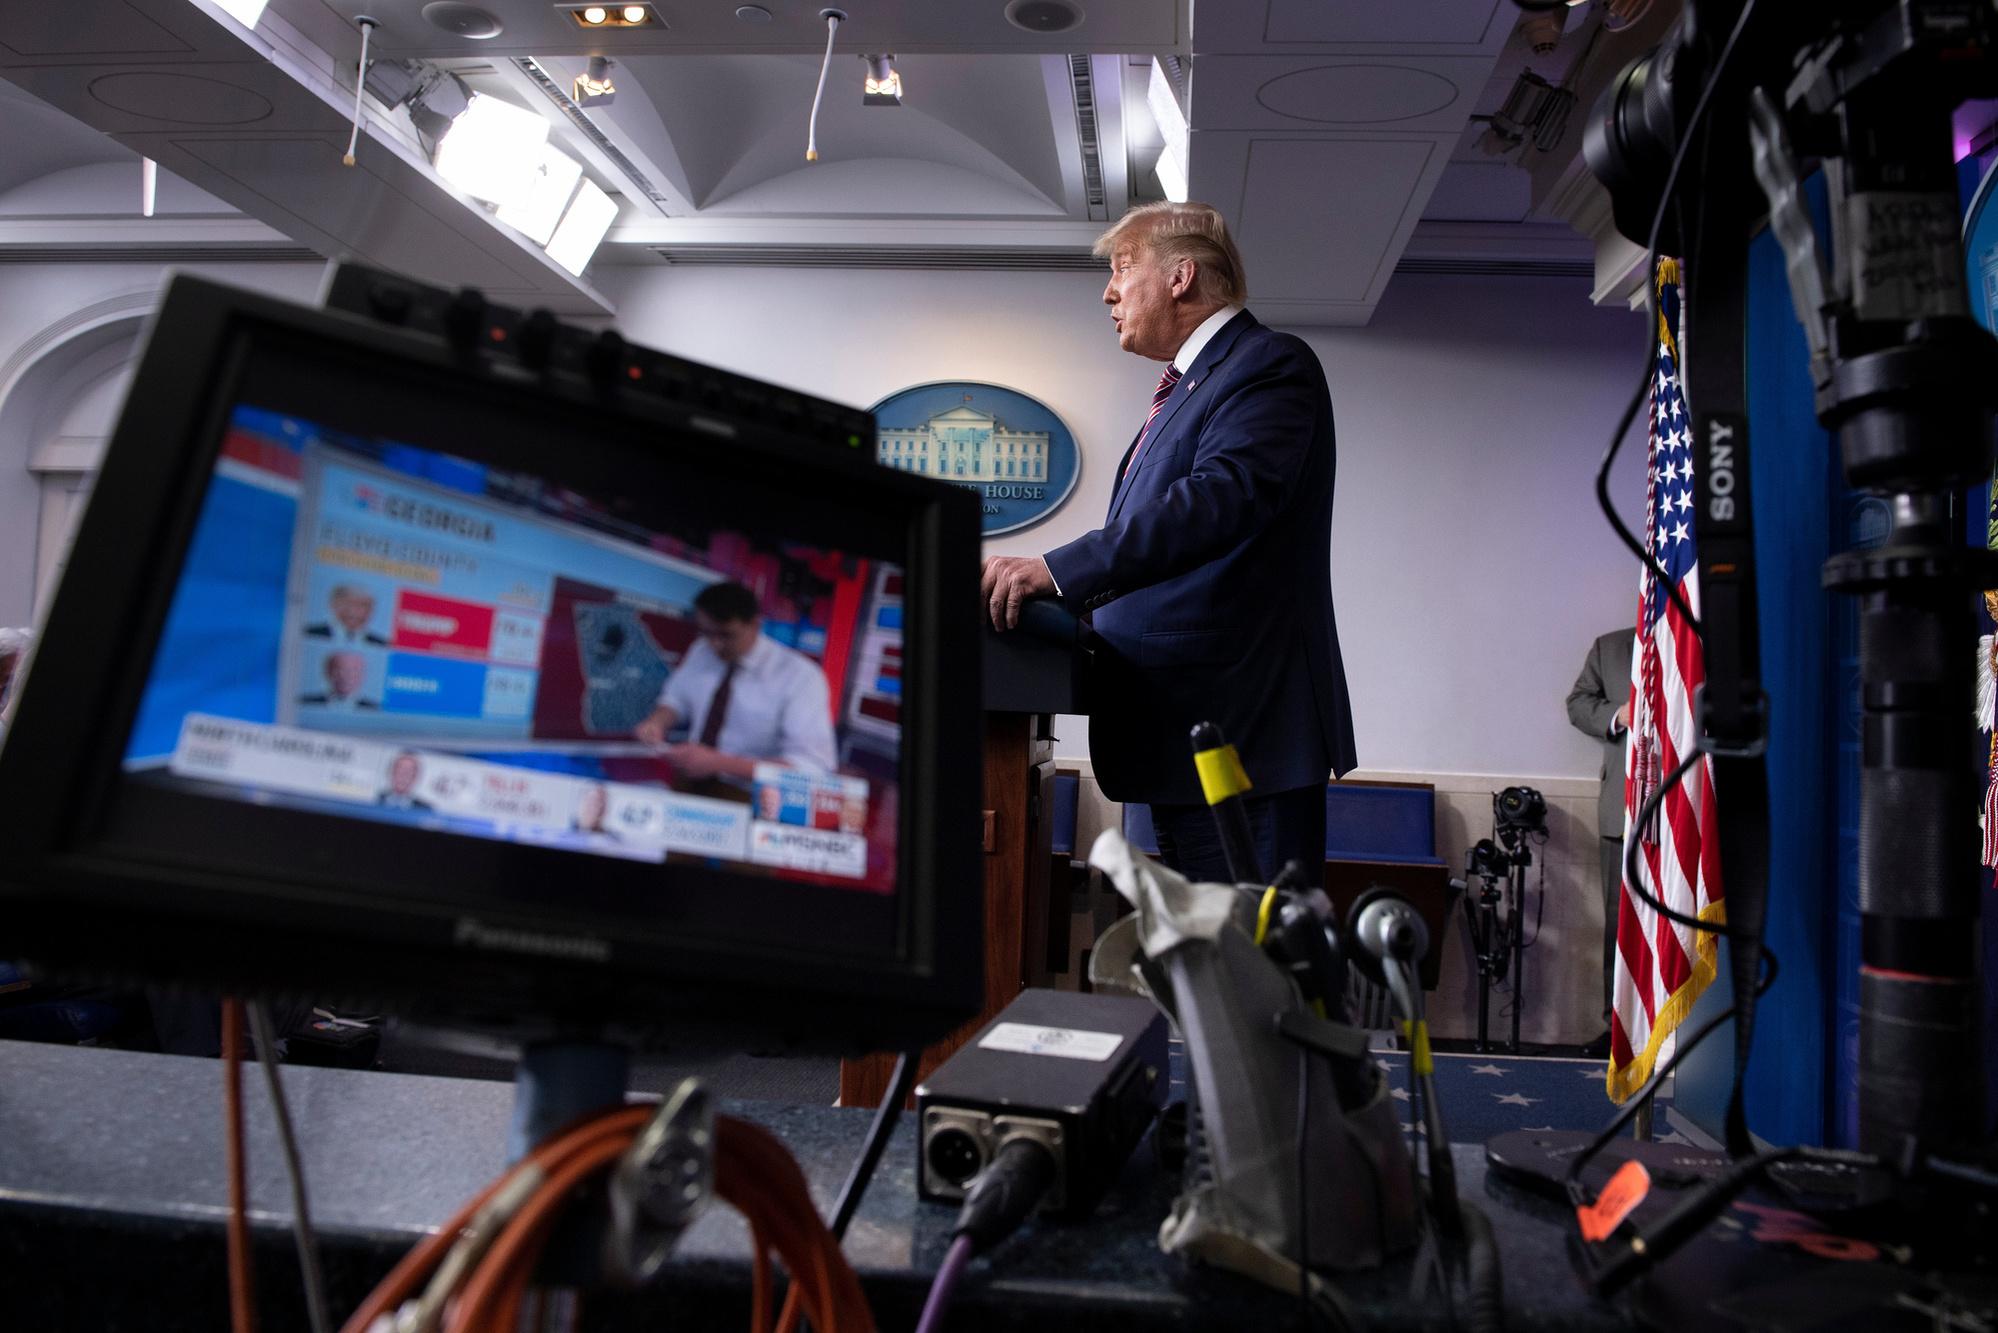 Brendan Smialowski / AFP